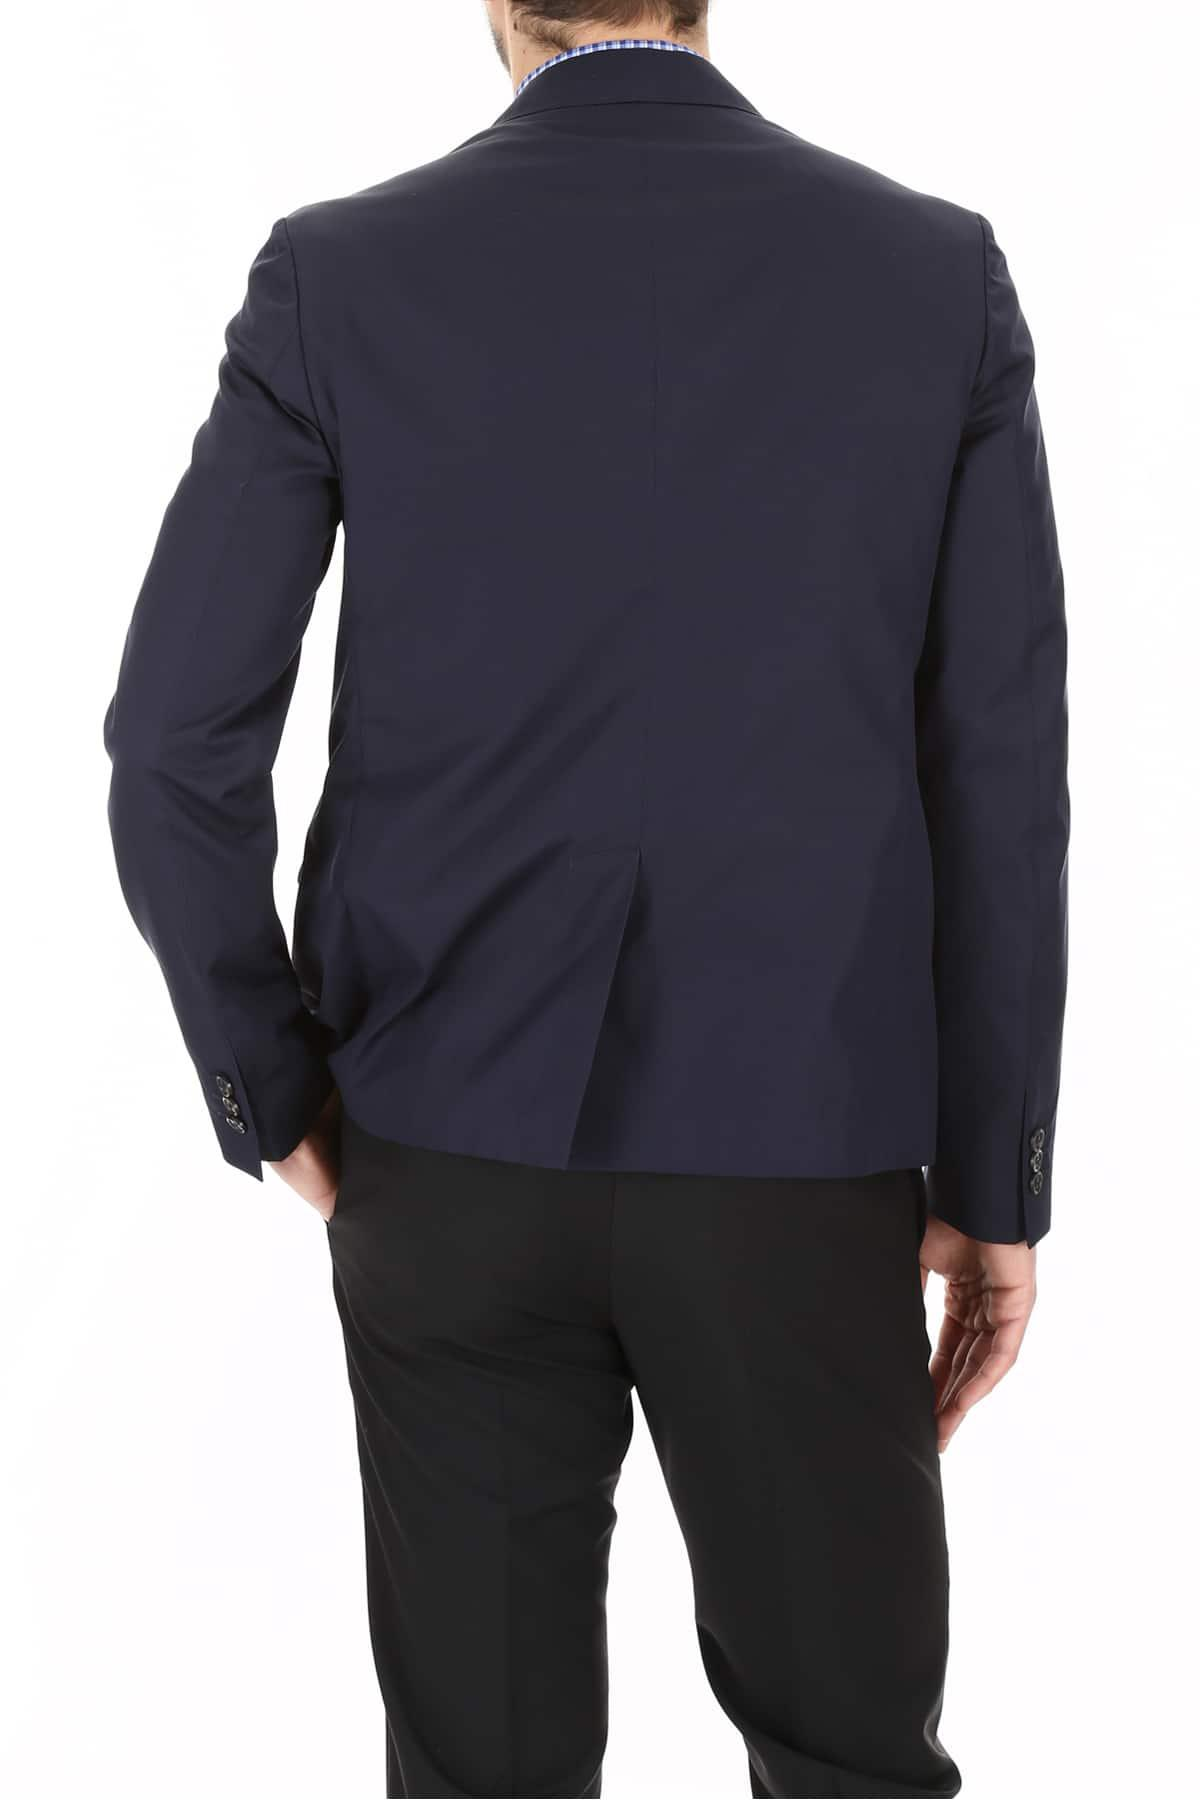 Prada Linea Rossa Cotton Poplin Blazer in Blue for Men